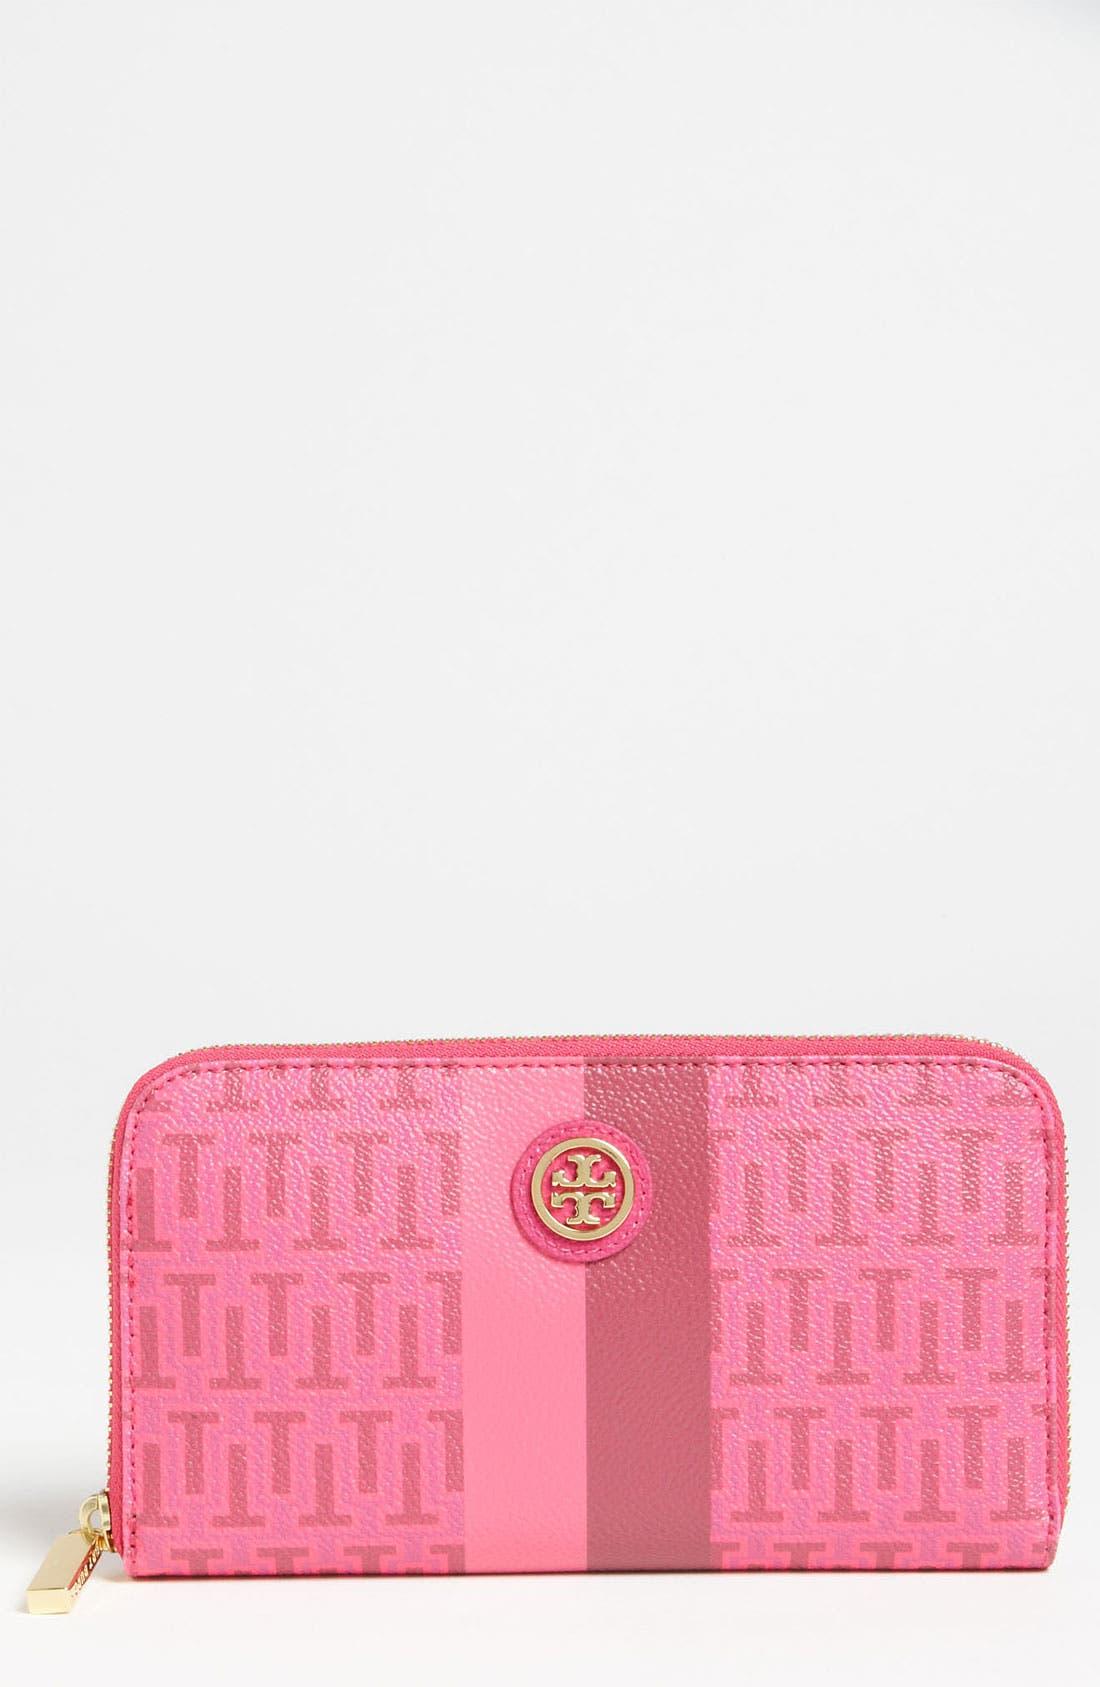 Main Image - Tory Burch 'Roslyn' Continental Zip Wallet